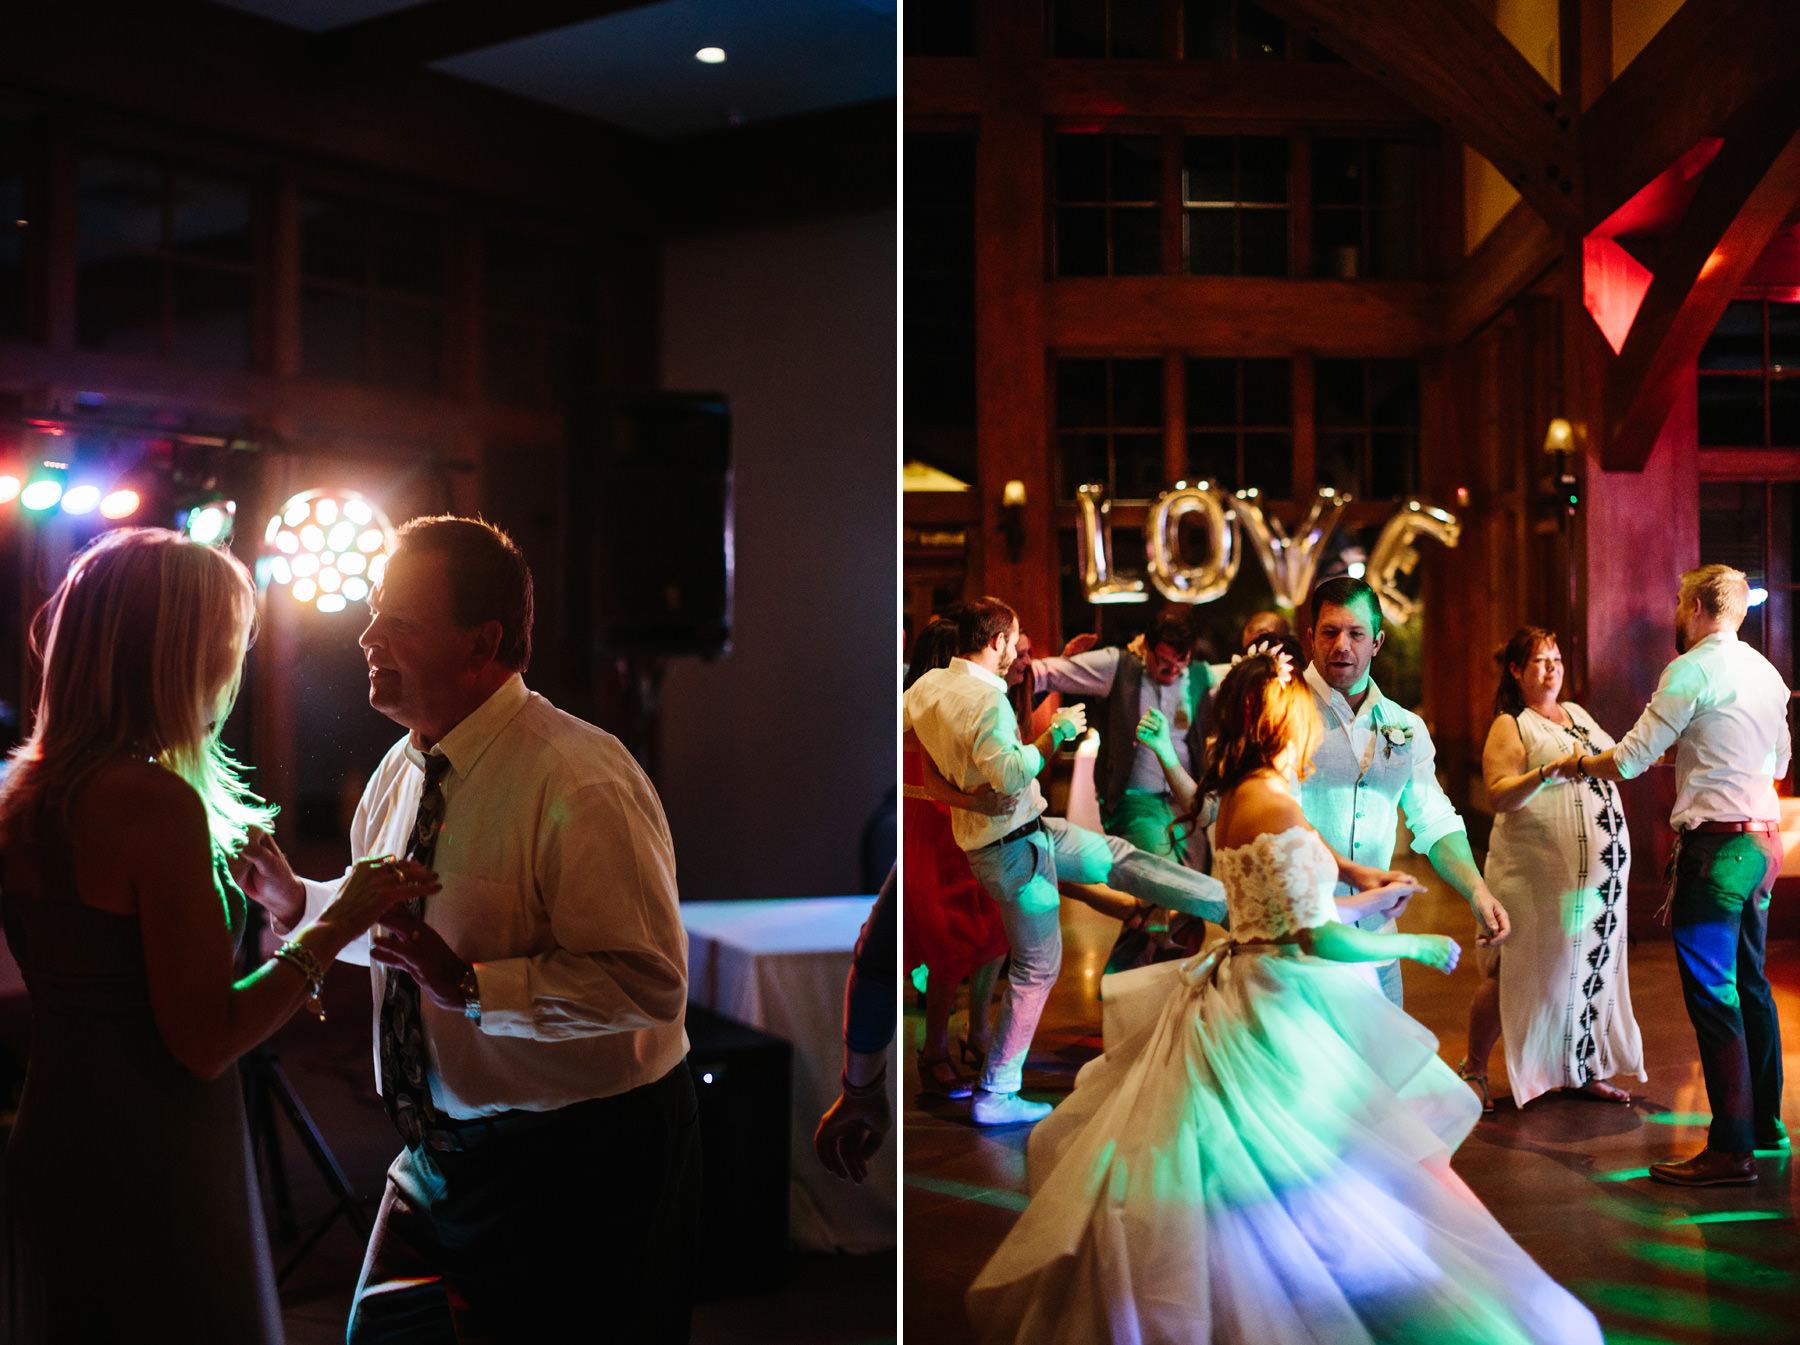 Vail Colorado Wedding Deck_ Kindling Wedding Photography92.JPG